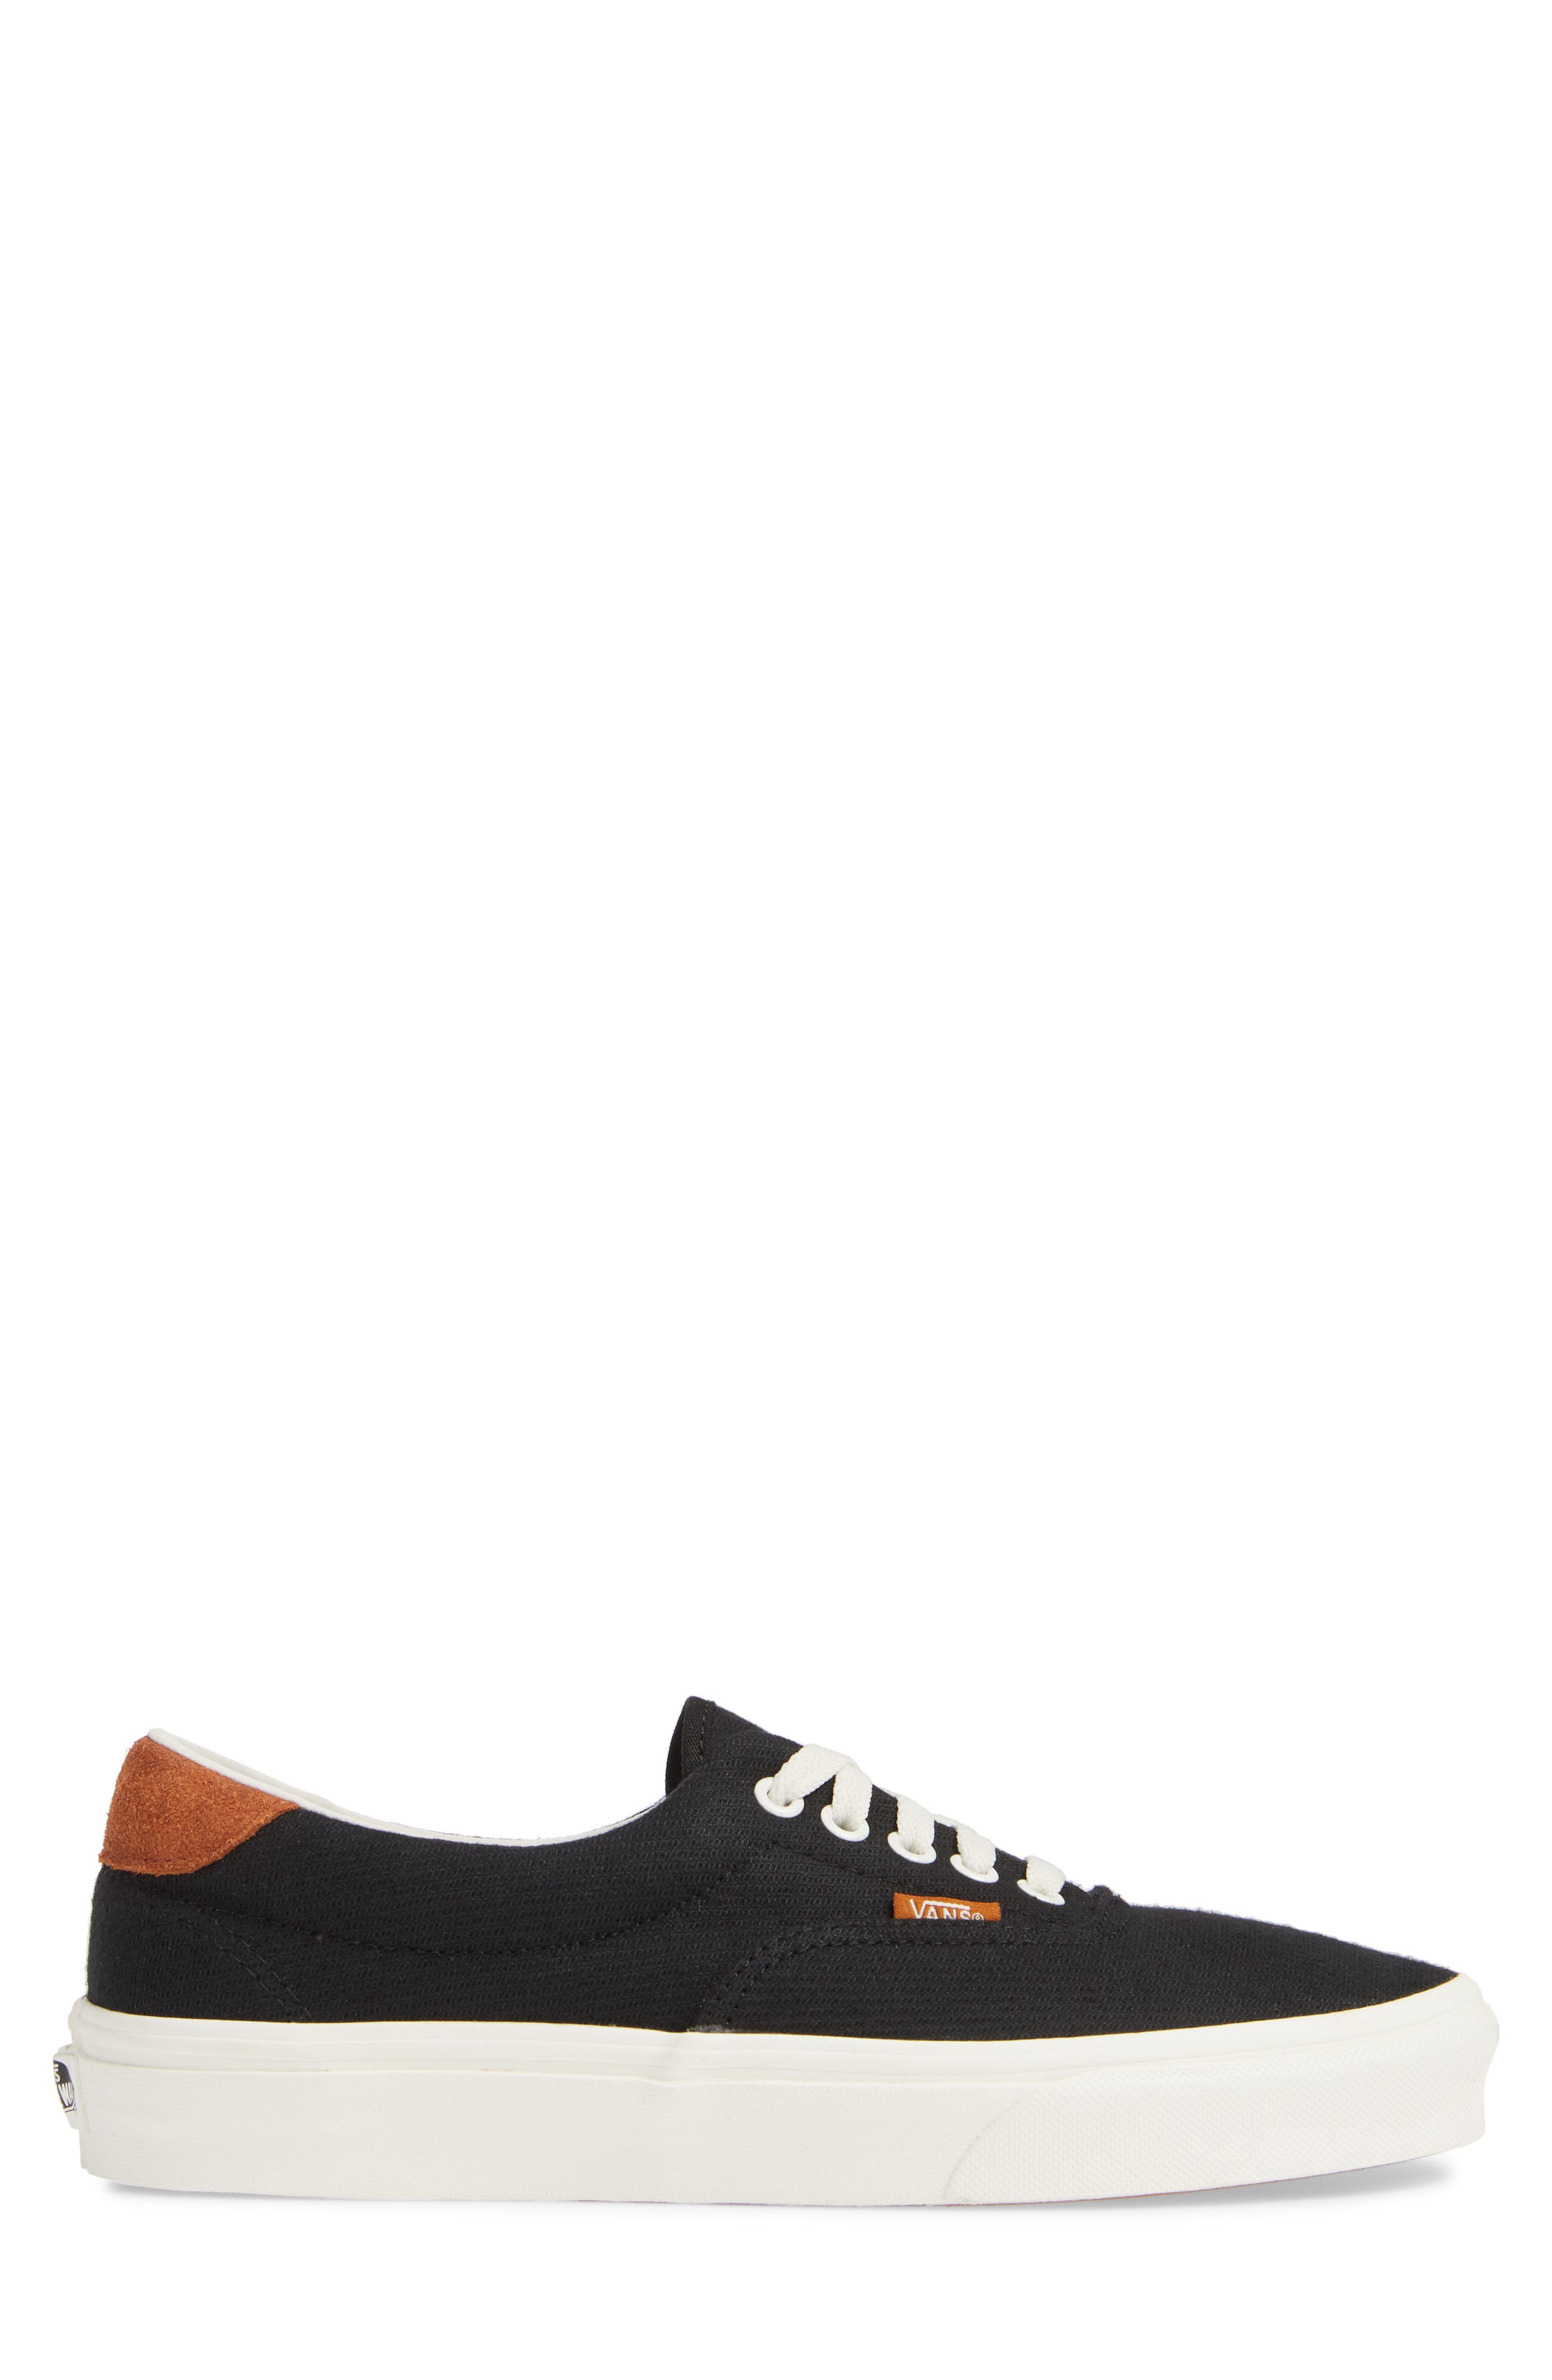 Flannel Era Sneaker,                             Alternate thumbnail 3, color,                             BLACK FLANNEL FLANNEL